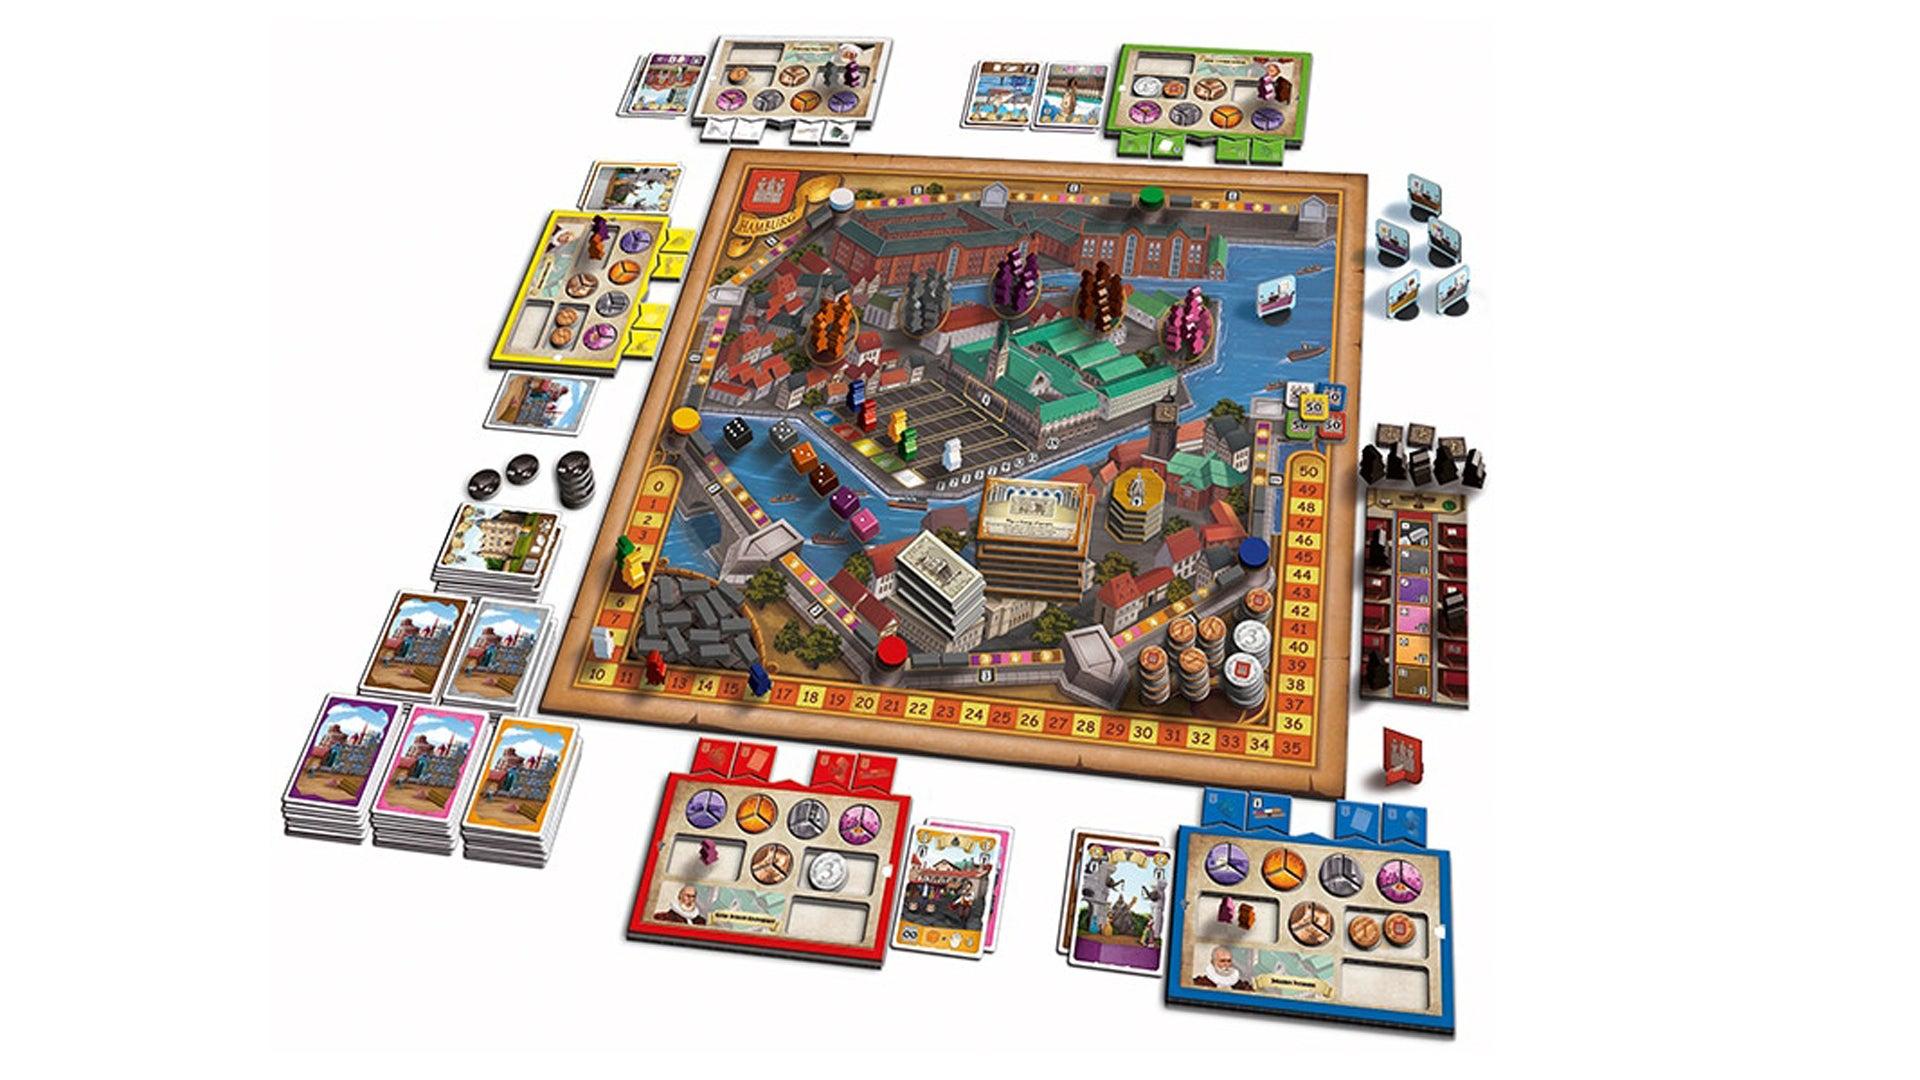 Hamburg board game layout